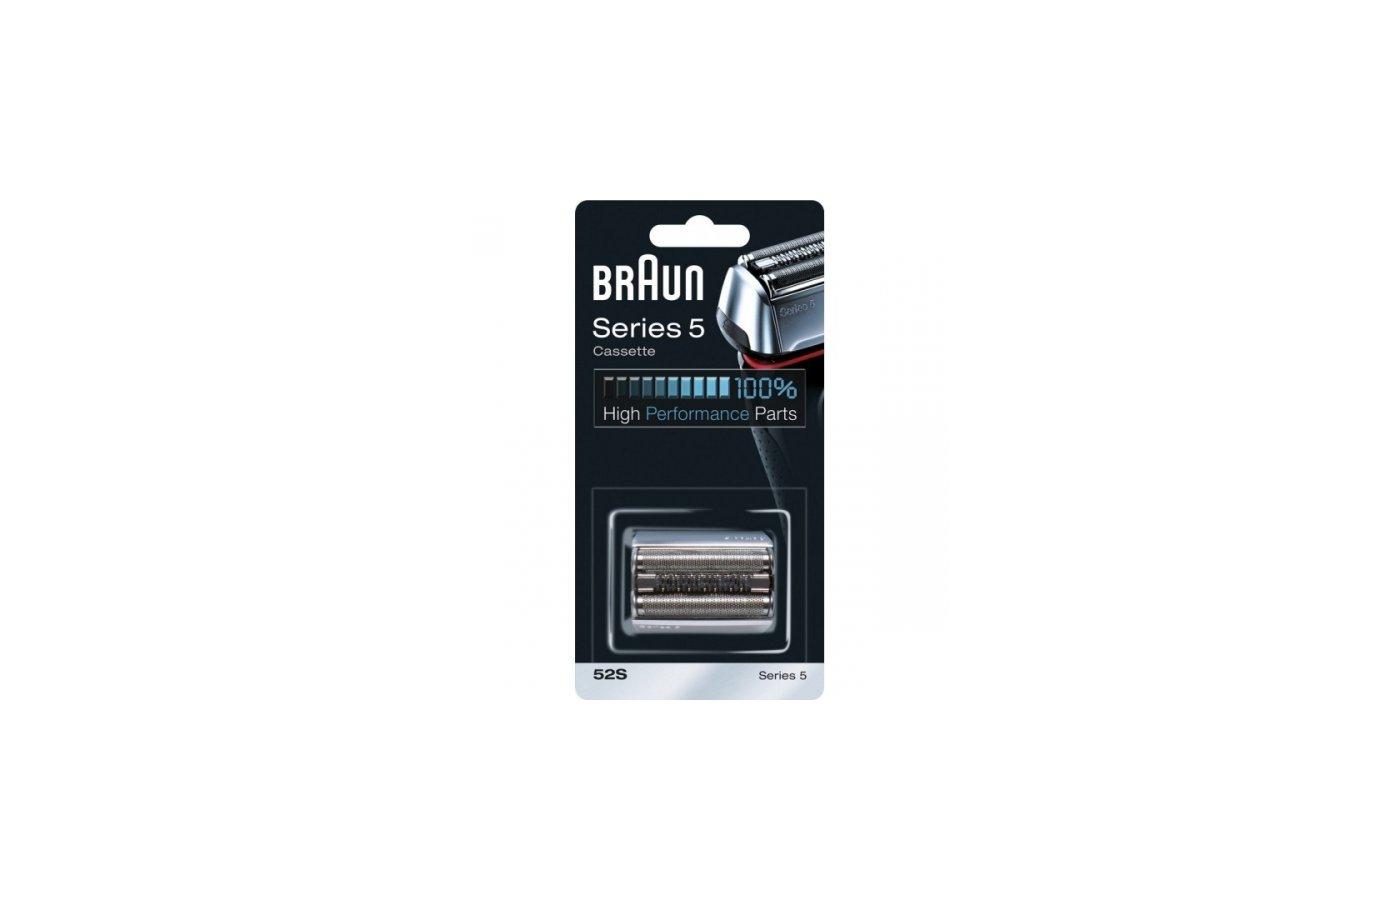 Сетки и блоки для бритв BRAUN сетка+реж.блок Series 5 52S